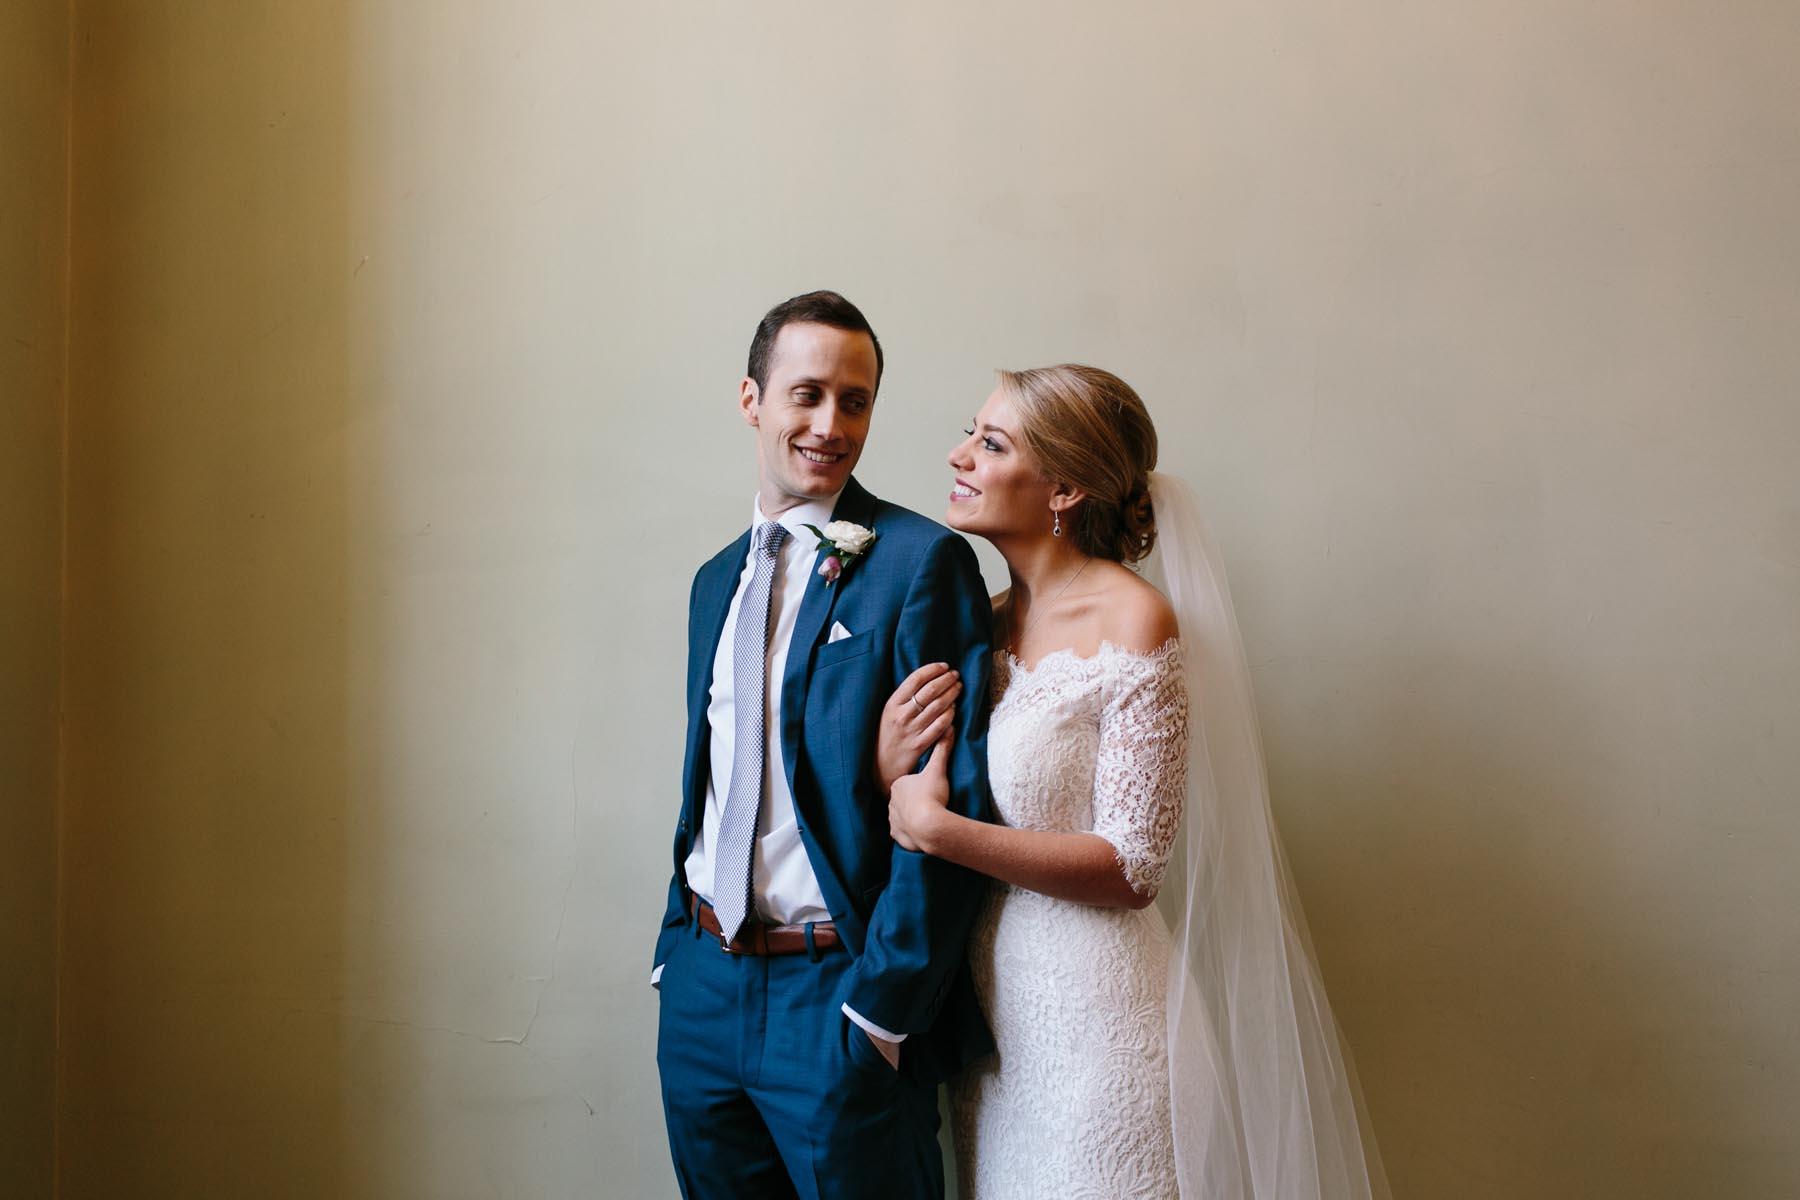 kjellman wedding blog biltmore wedding -44